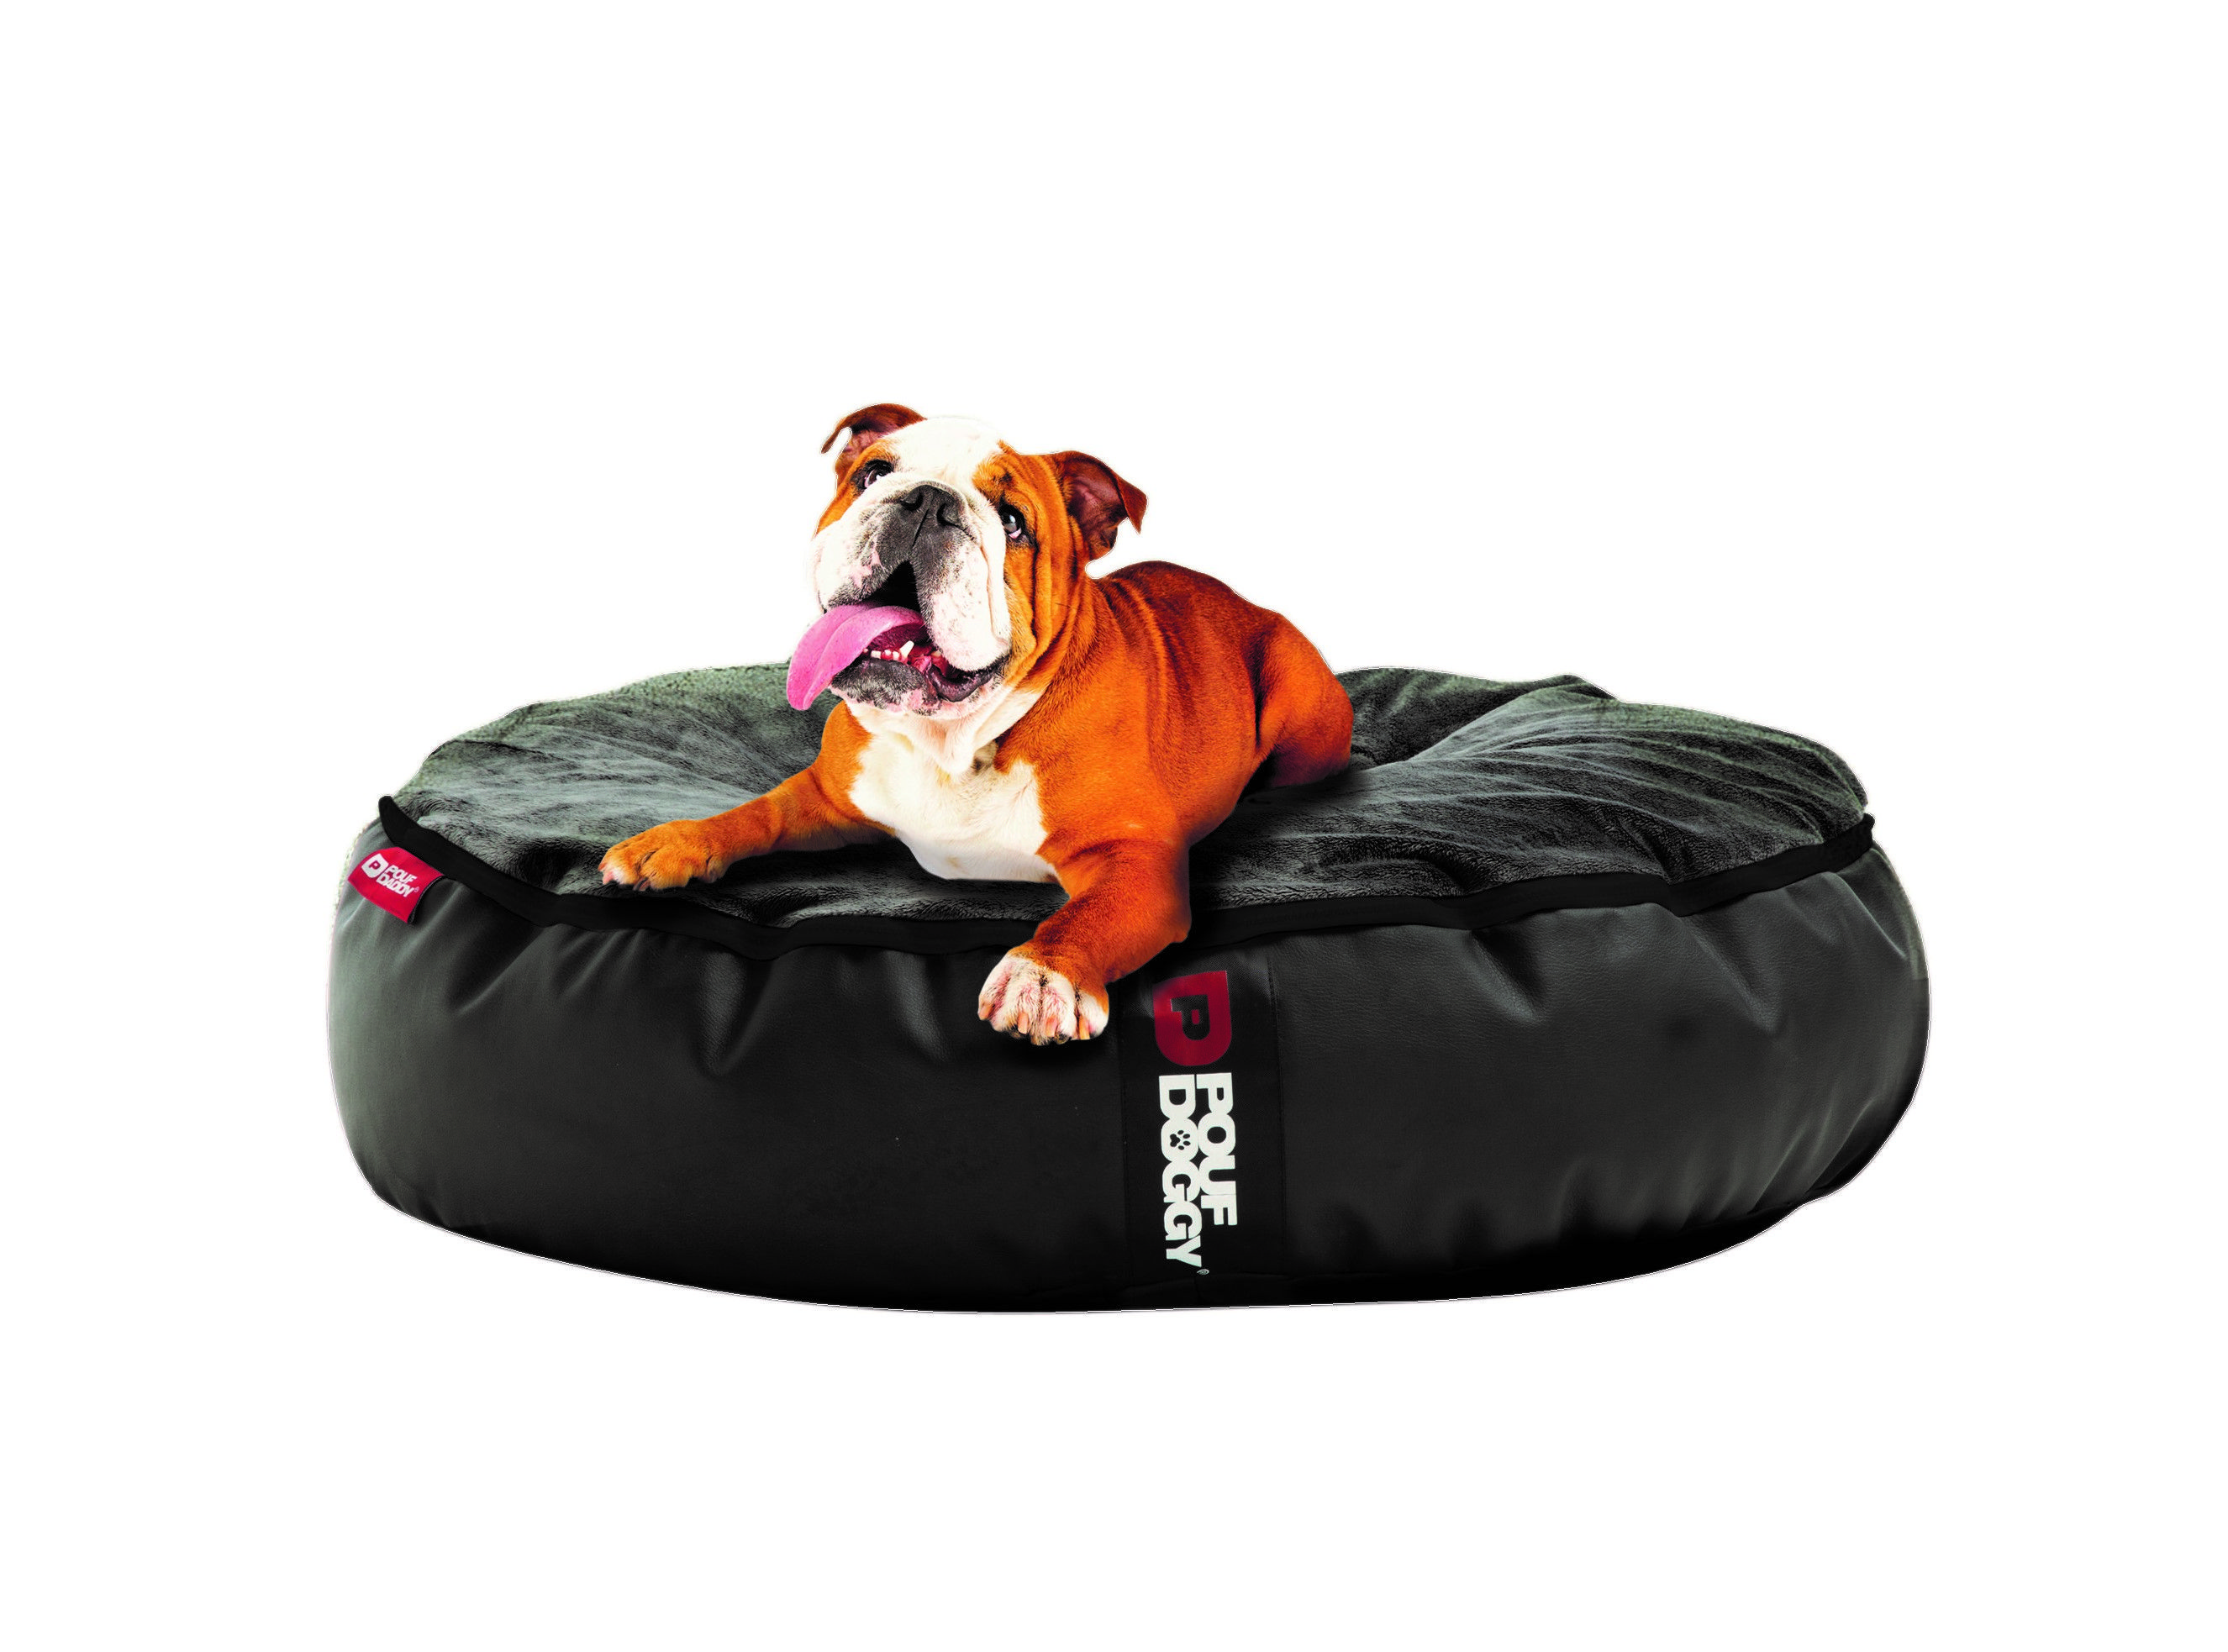 Pouf Doggy Grey Top dog beds, Bean bag furniture, Doggy